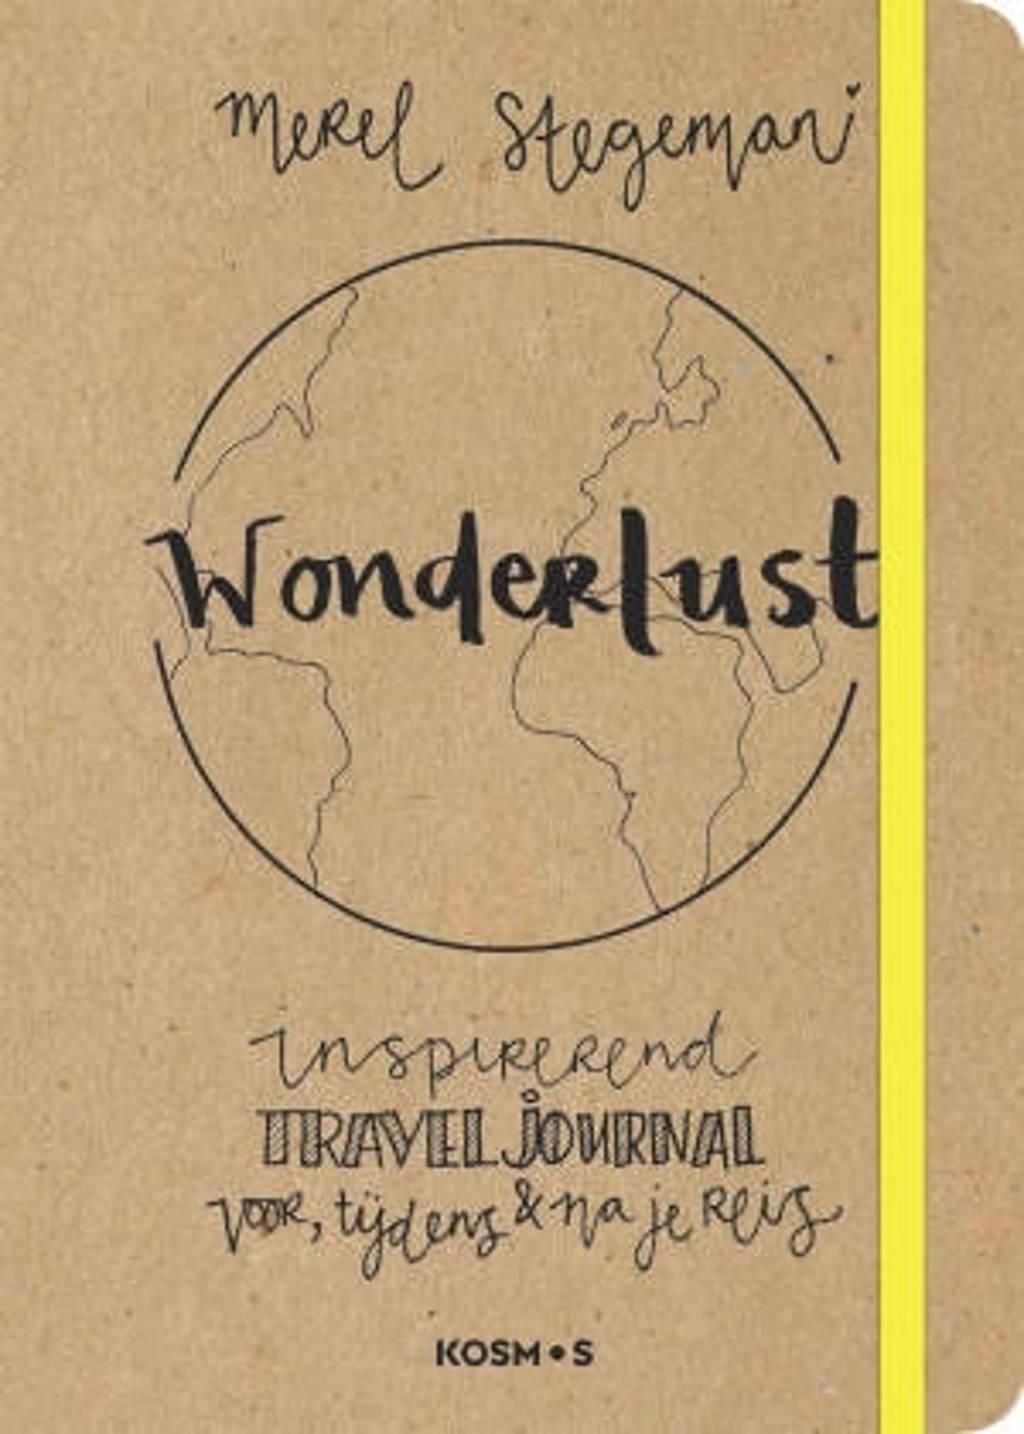 Wonderlust - Merel Stegeman